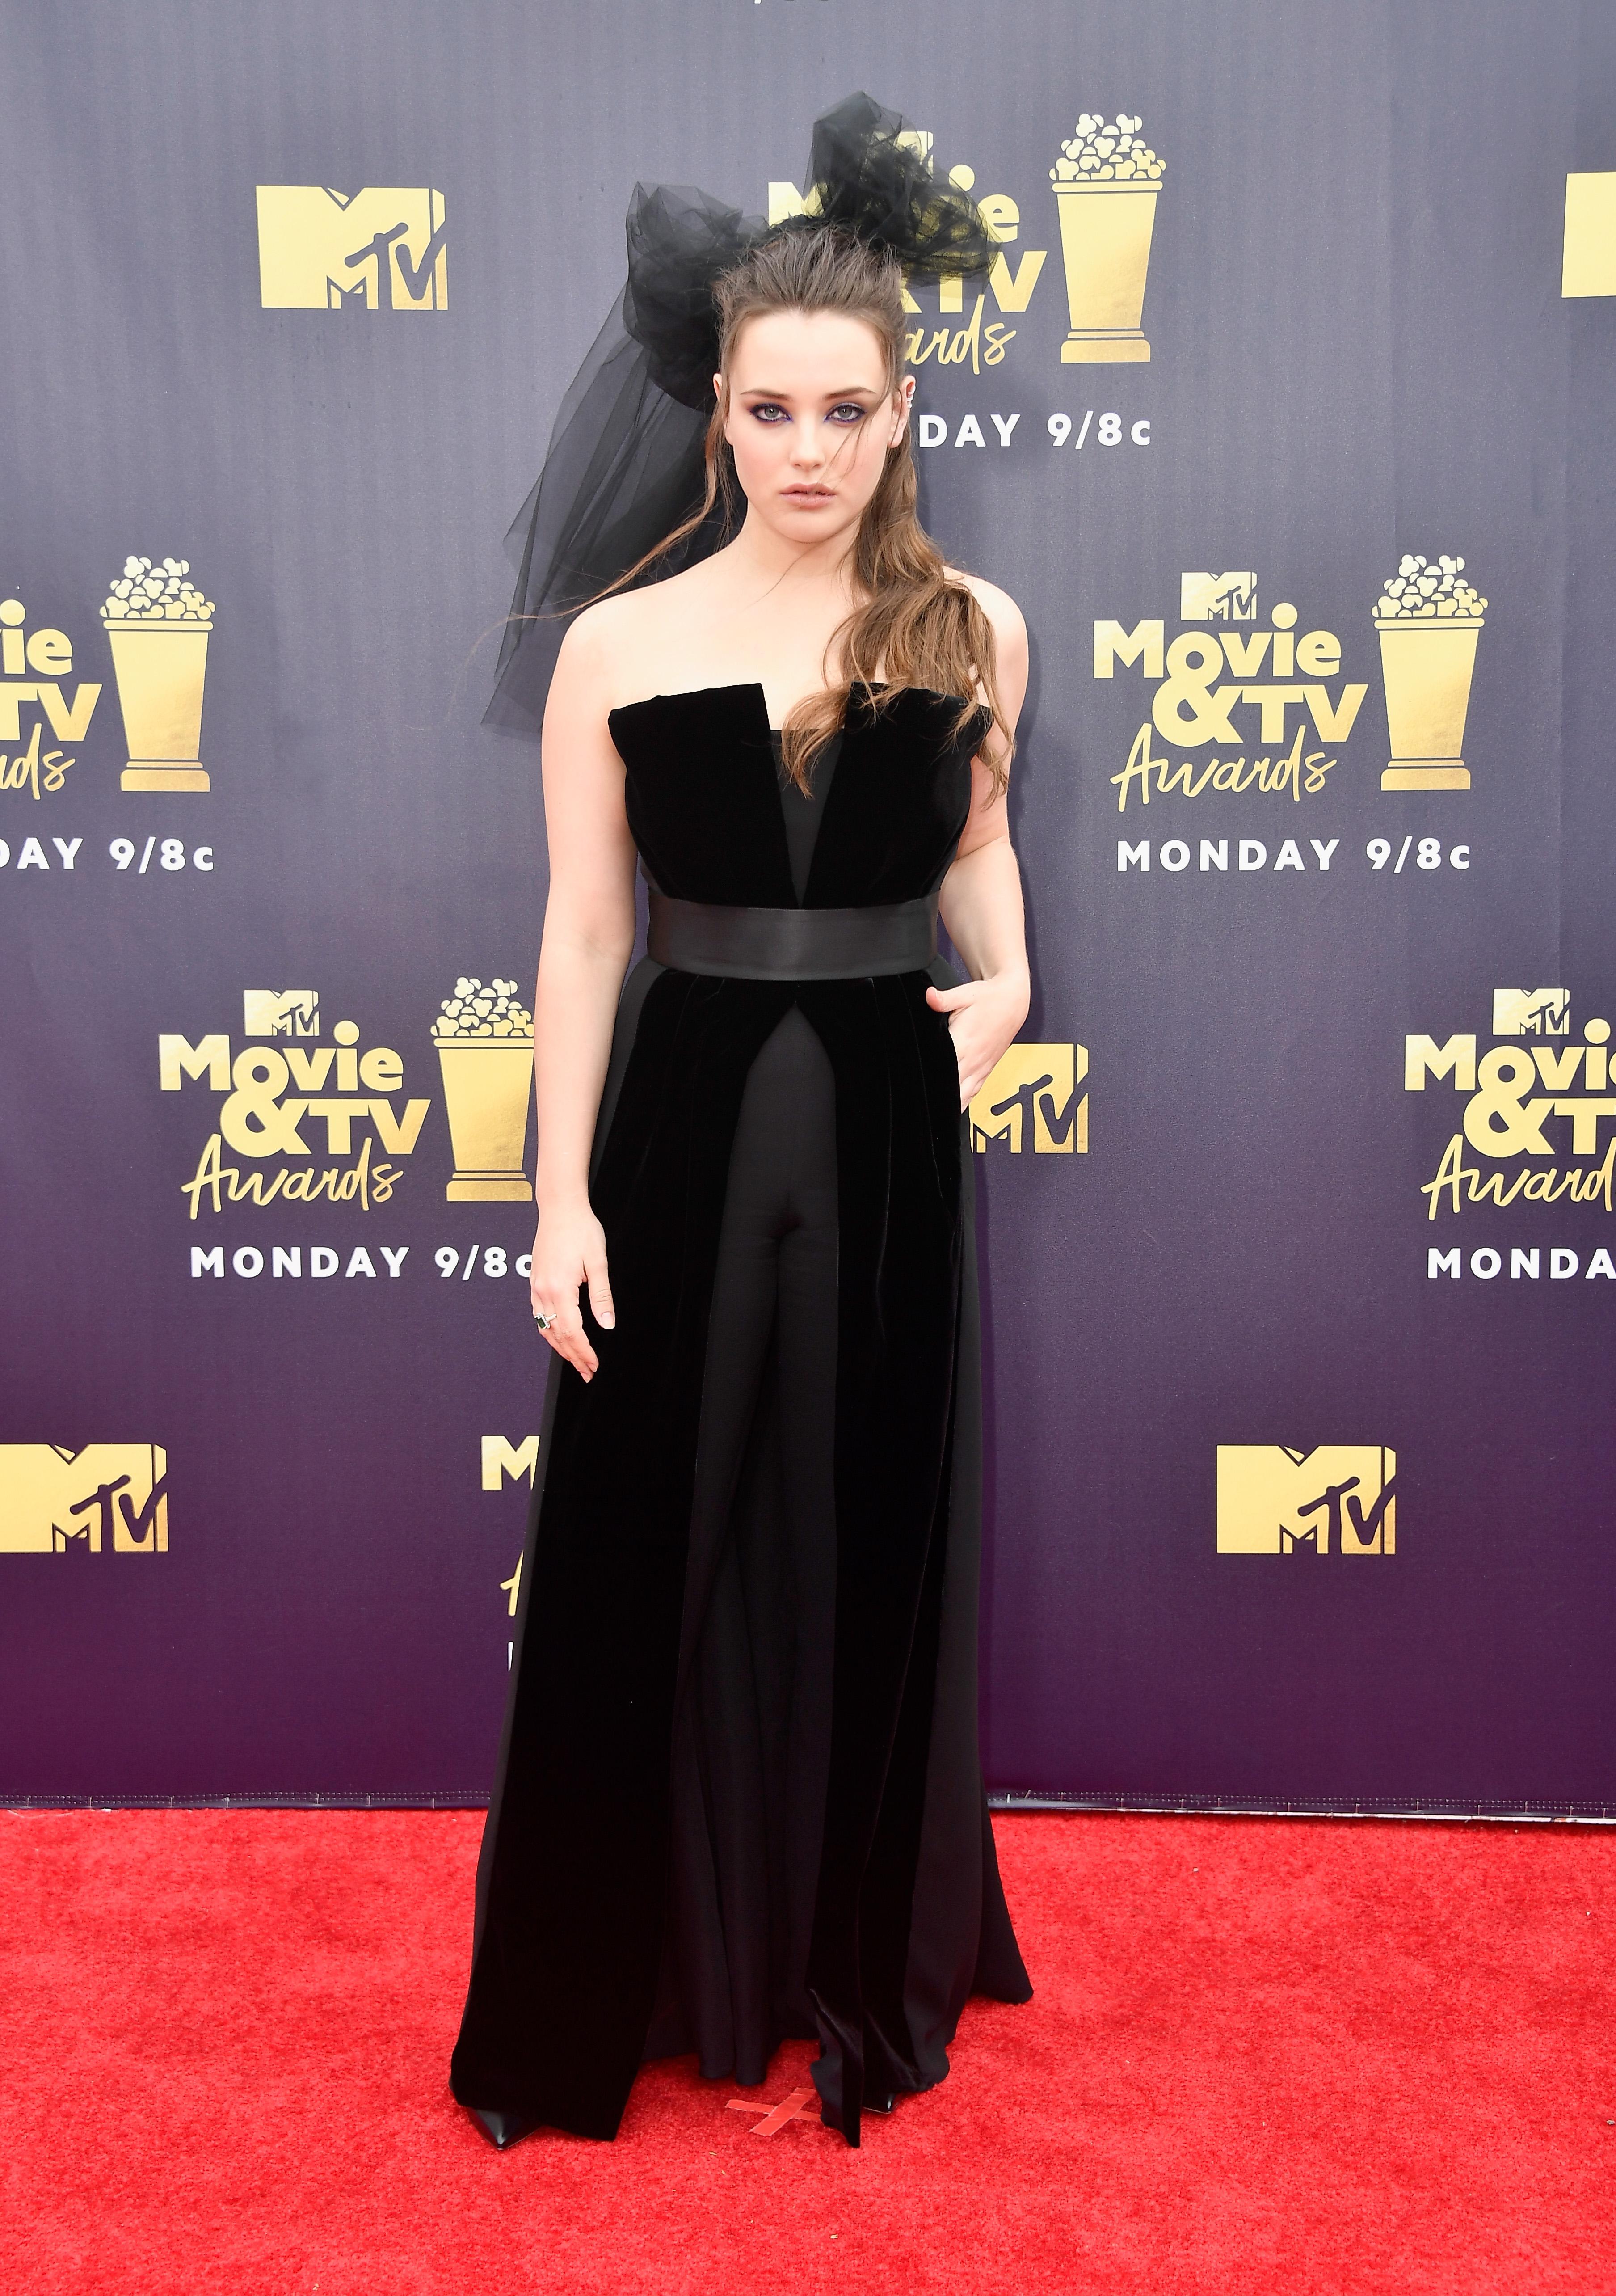 Katherine-langford-MTV Movie And TV Awards-2018